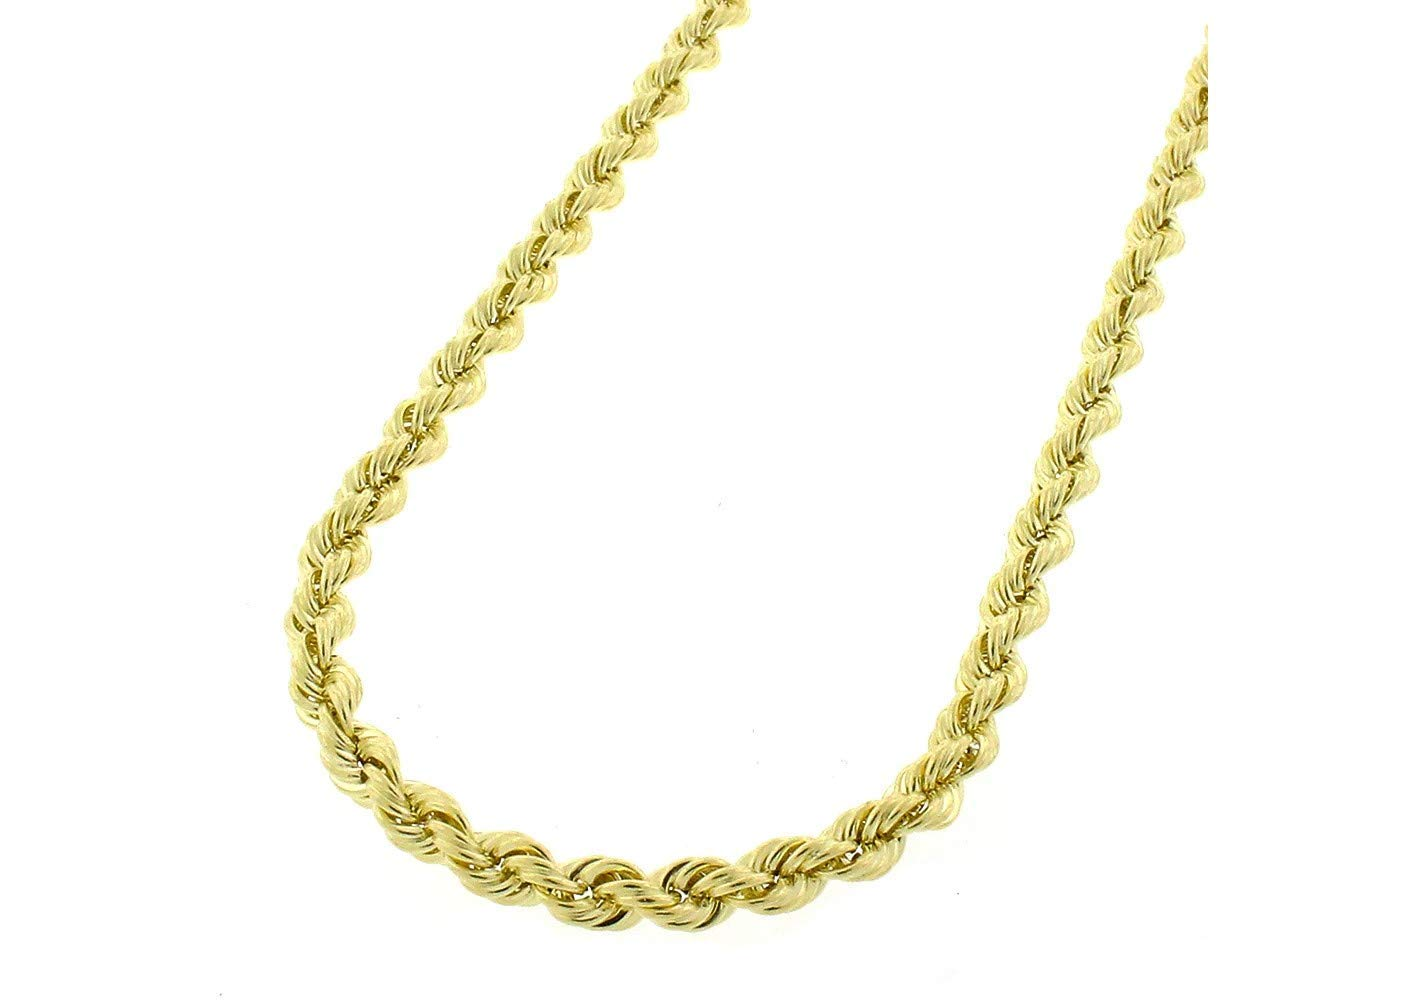 Orostar 10K Yellow Gold 4mm Diamond Cut Handmade Rope Chain Necklace, 16'' - 30'' (20)